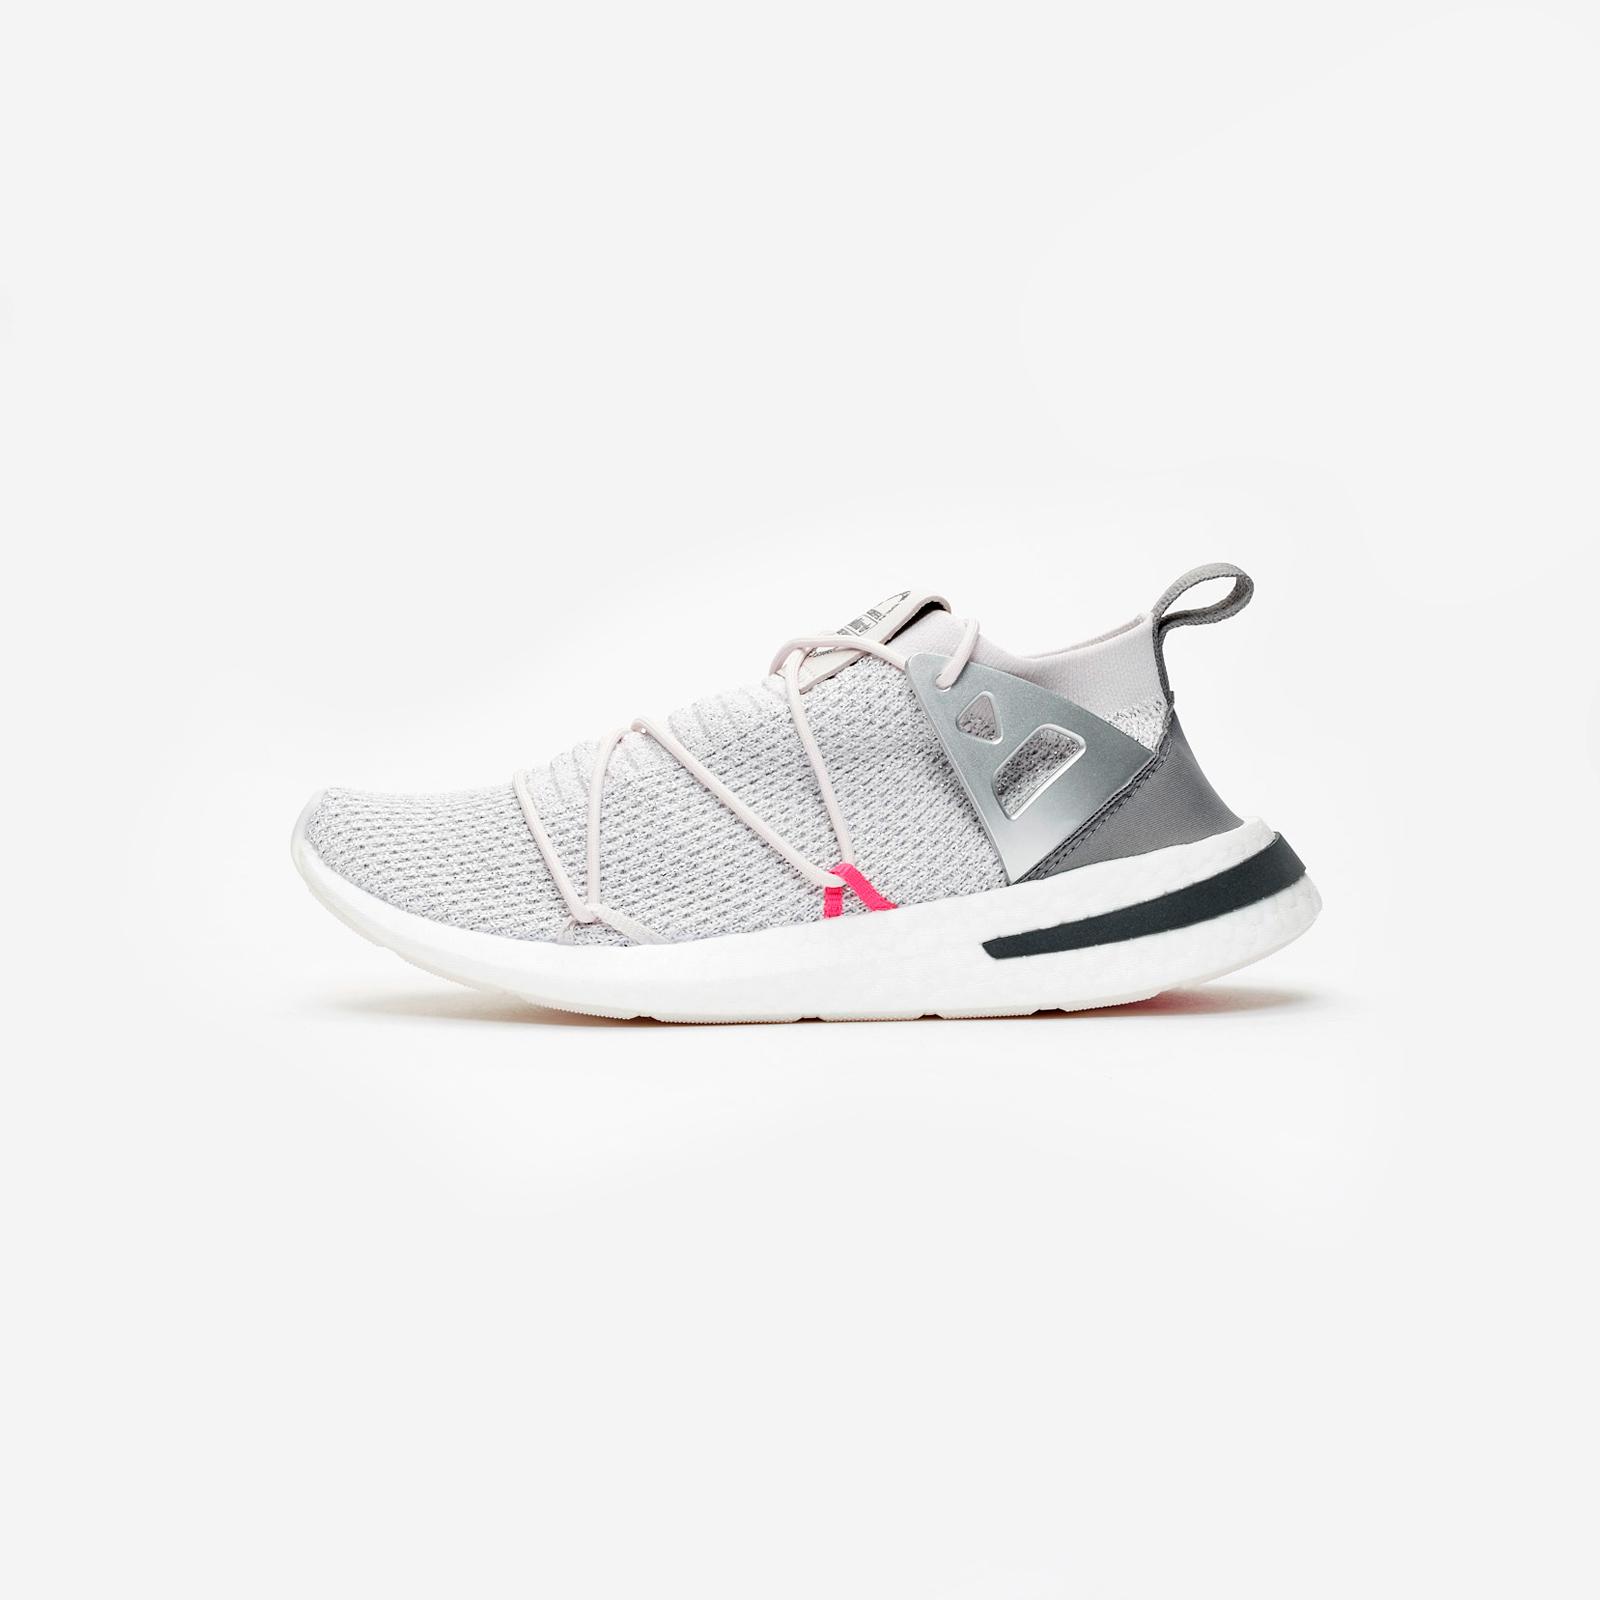 d8e4c13c776 adidas Arkyn PK W - D96760 - Sneakersnstuff